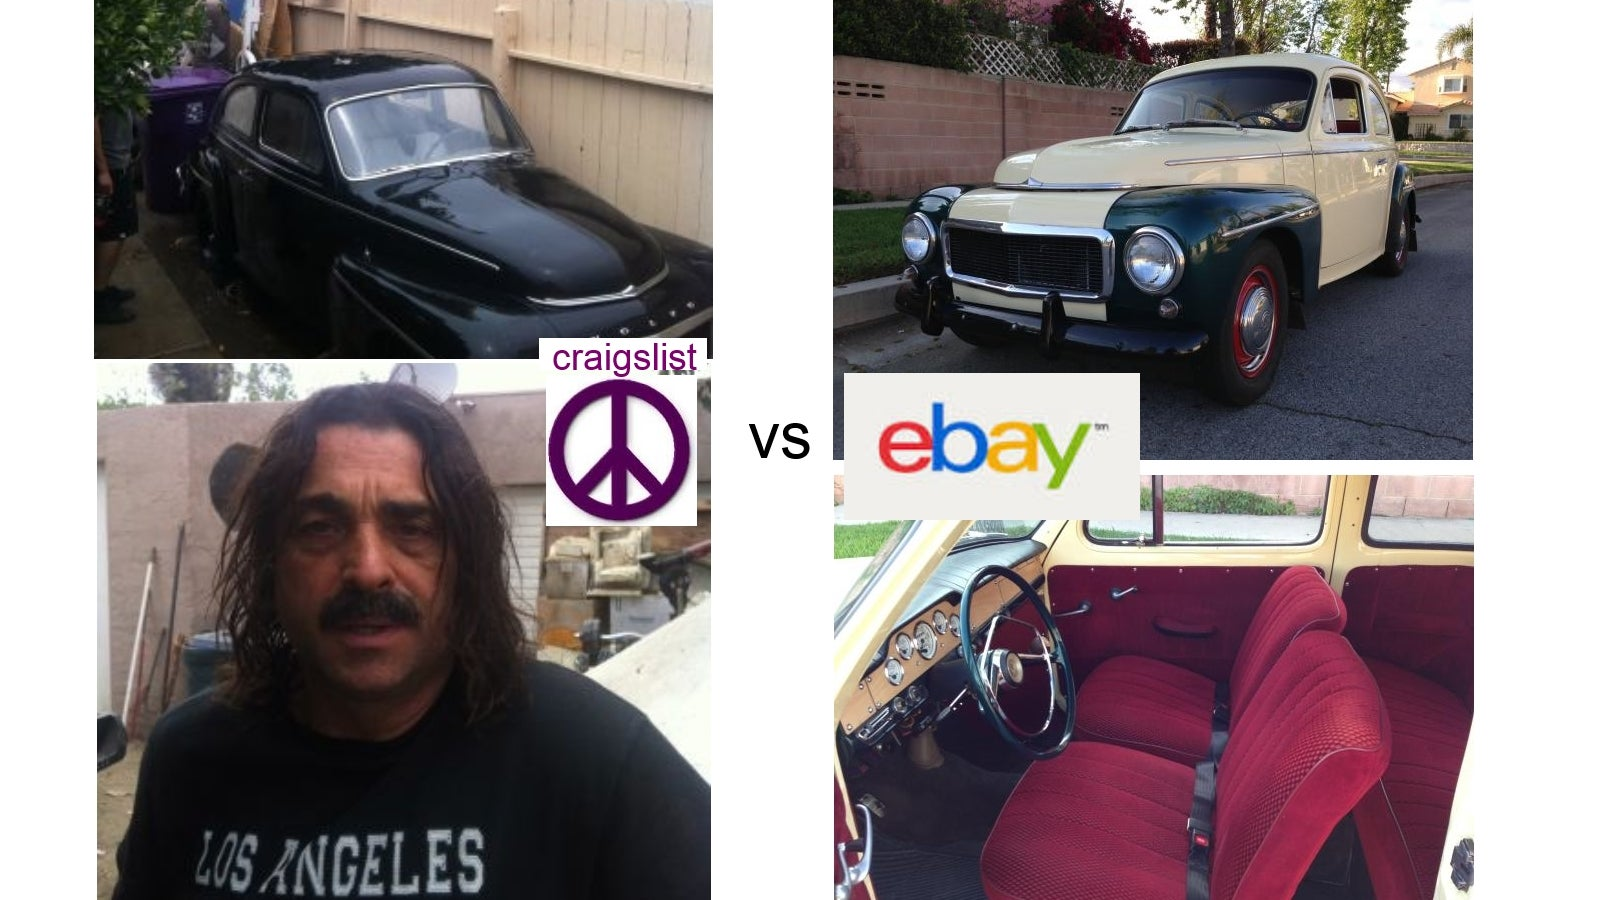 Musings On Buying Amp Selling Cars On Craigslist Vs Ebay